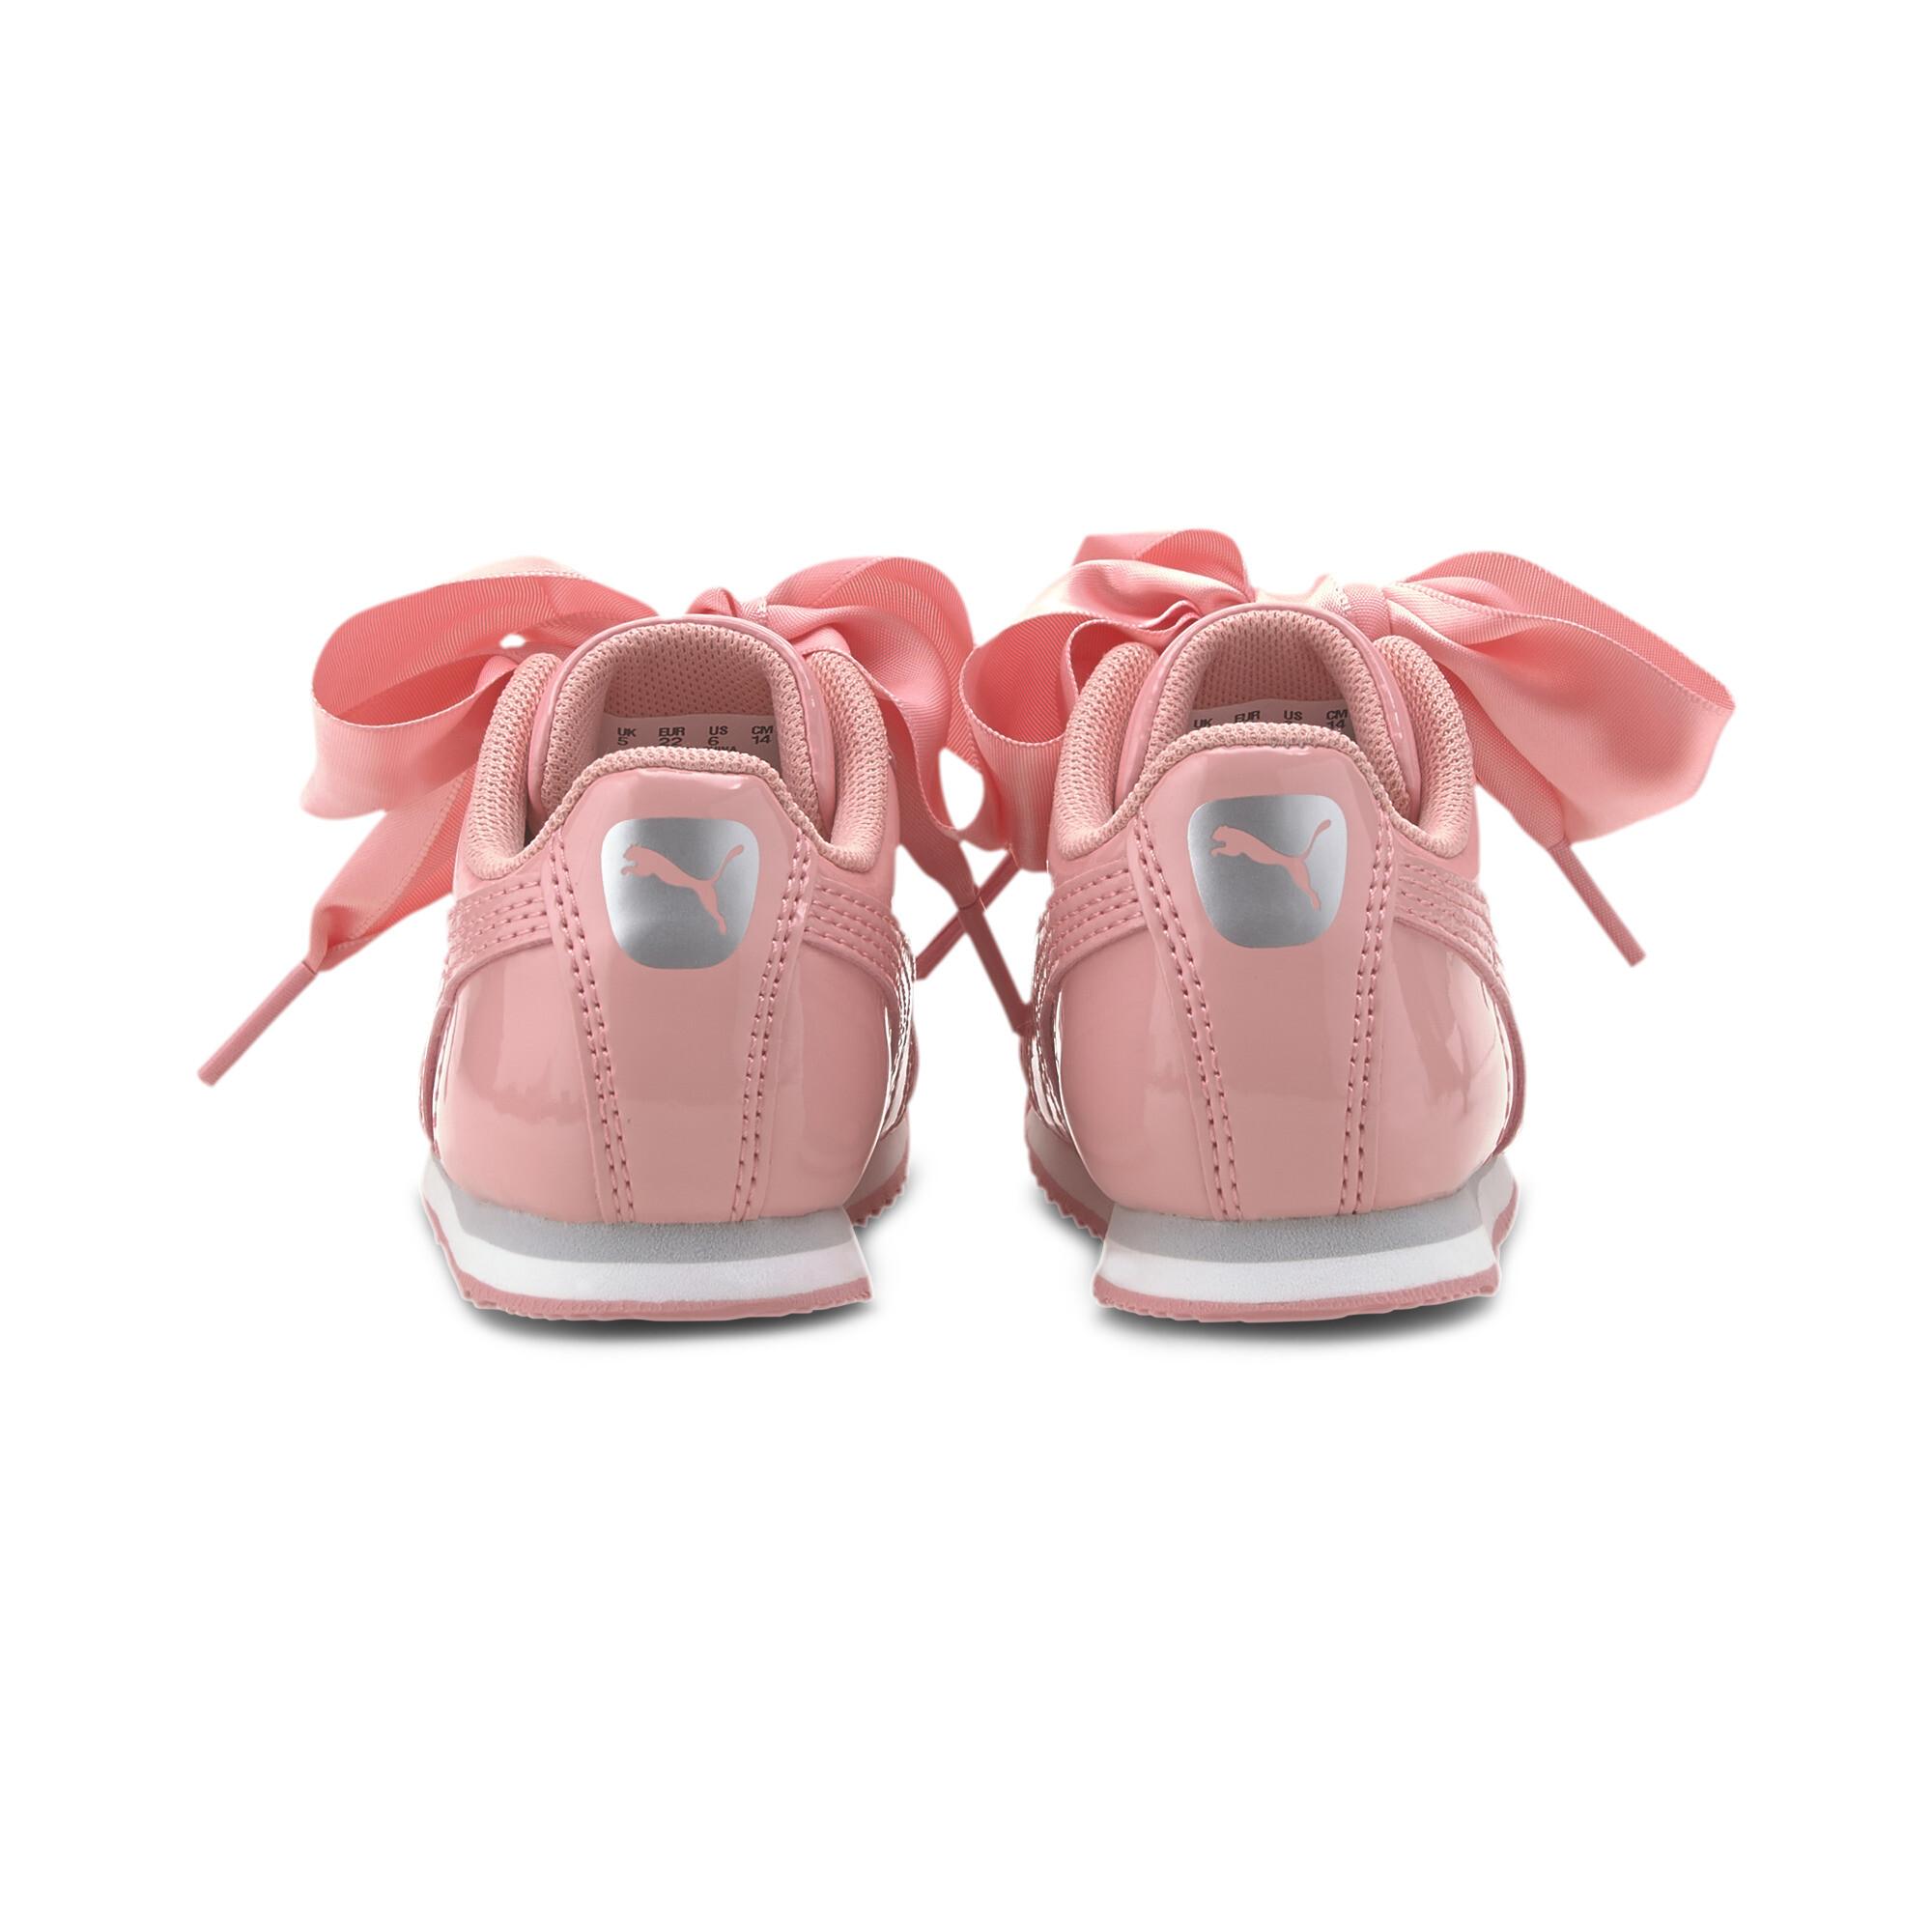 PUMA-Roma-Heart-Patent-Toddler-Shoes-Girls-Shoe-Kids thumbnail 21